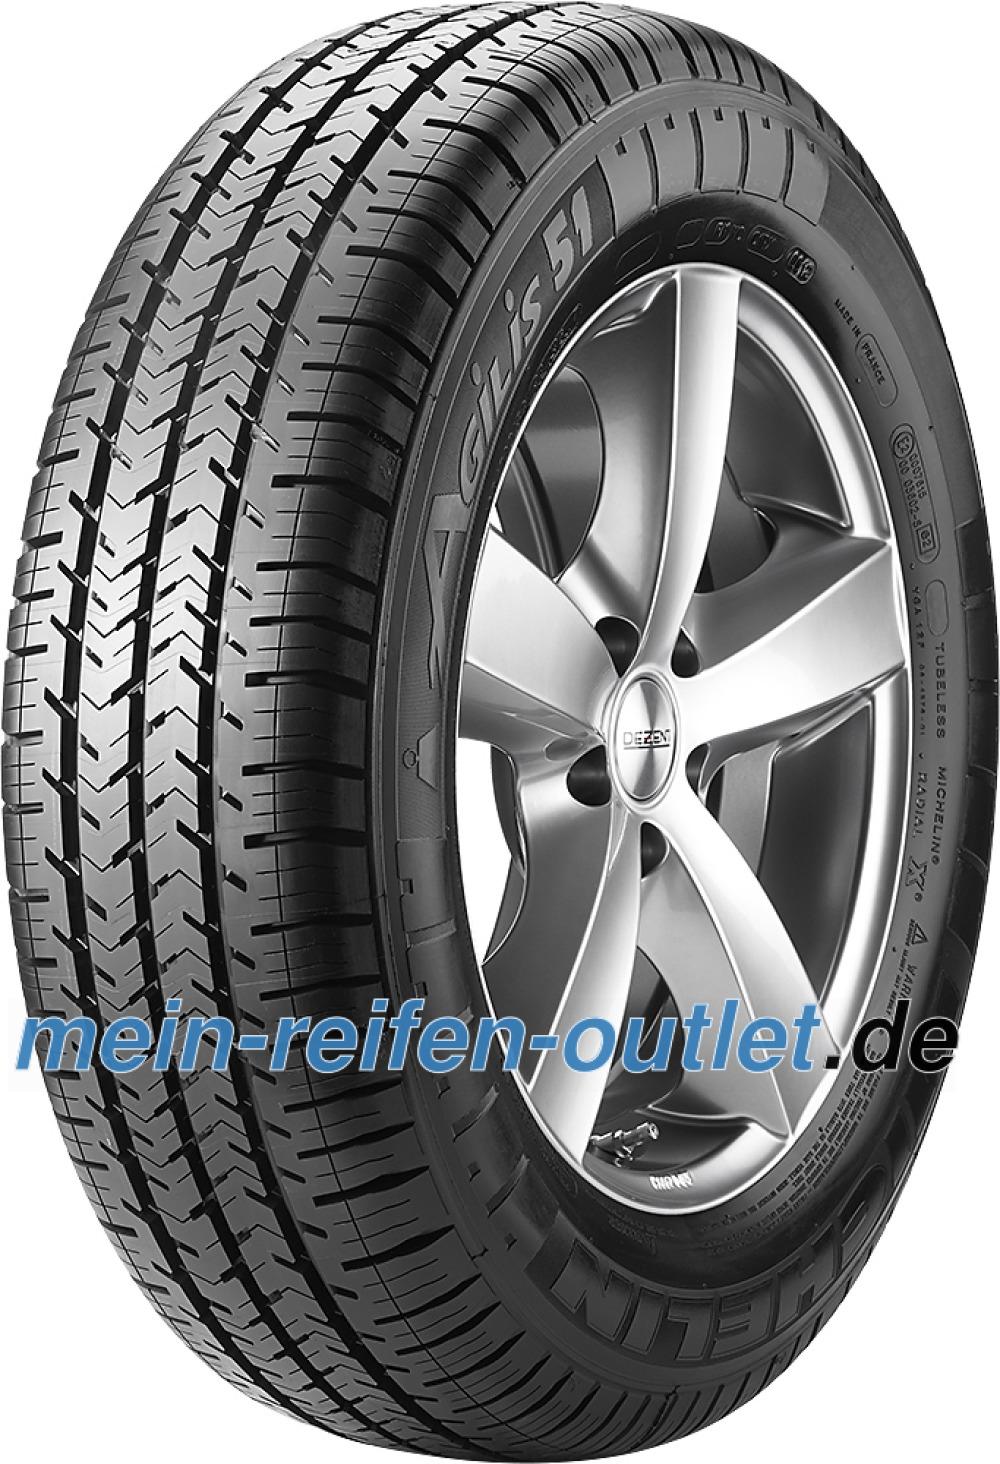 Michelin Agilis 51 ( 225/60 R16C 105/103T Doppelkennung 101H )